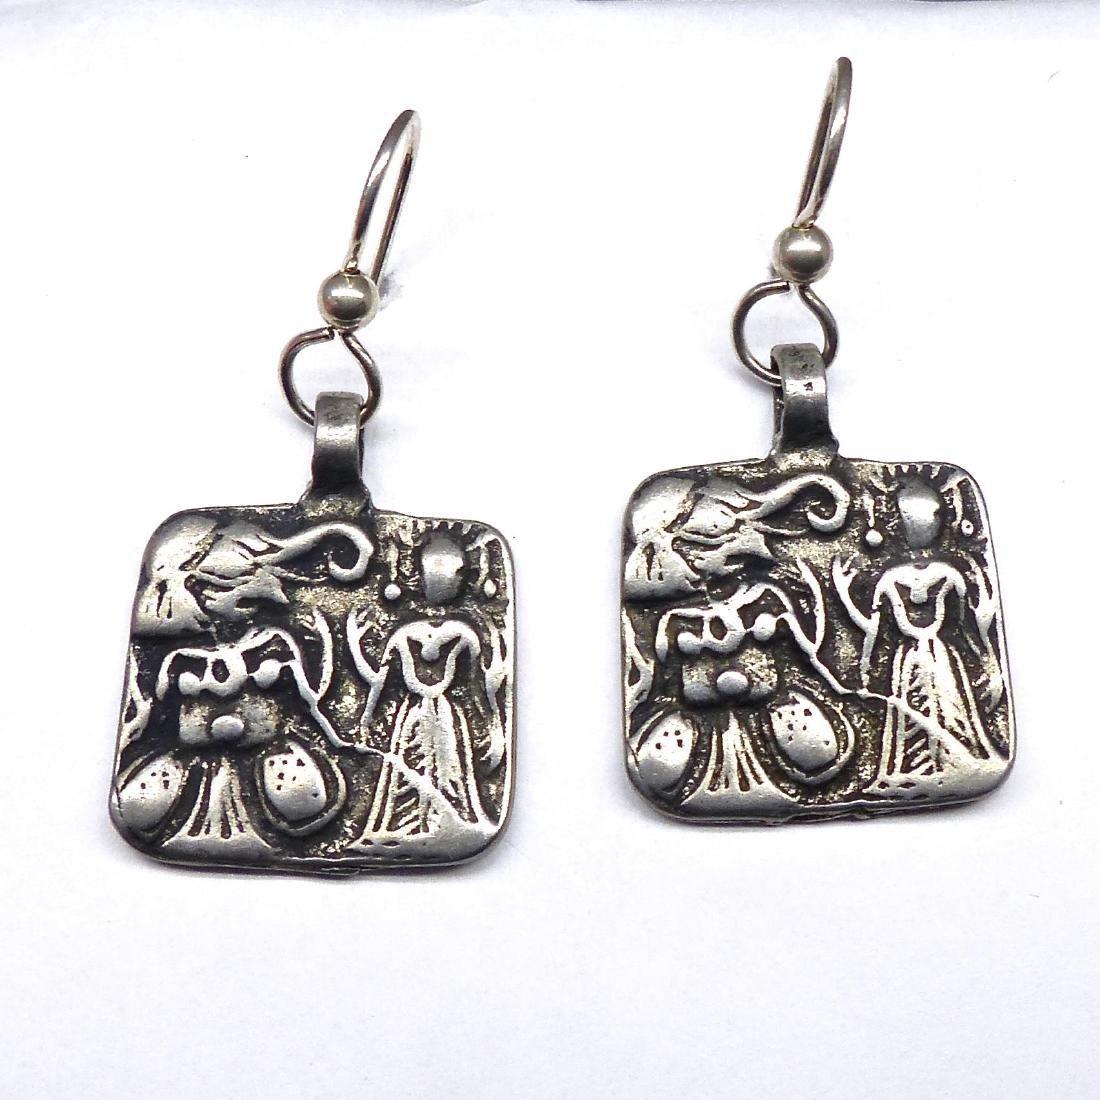 Vintage Silver Indian Pendants of Hanuman and Earrings